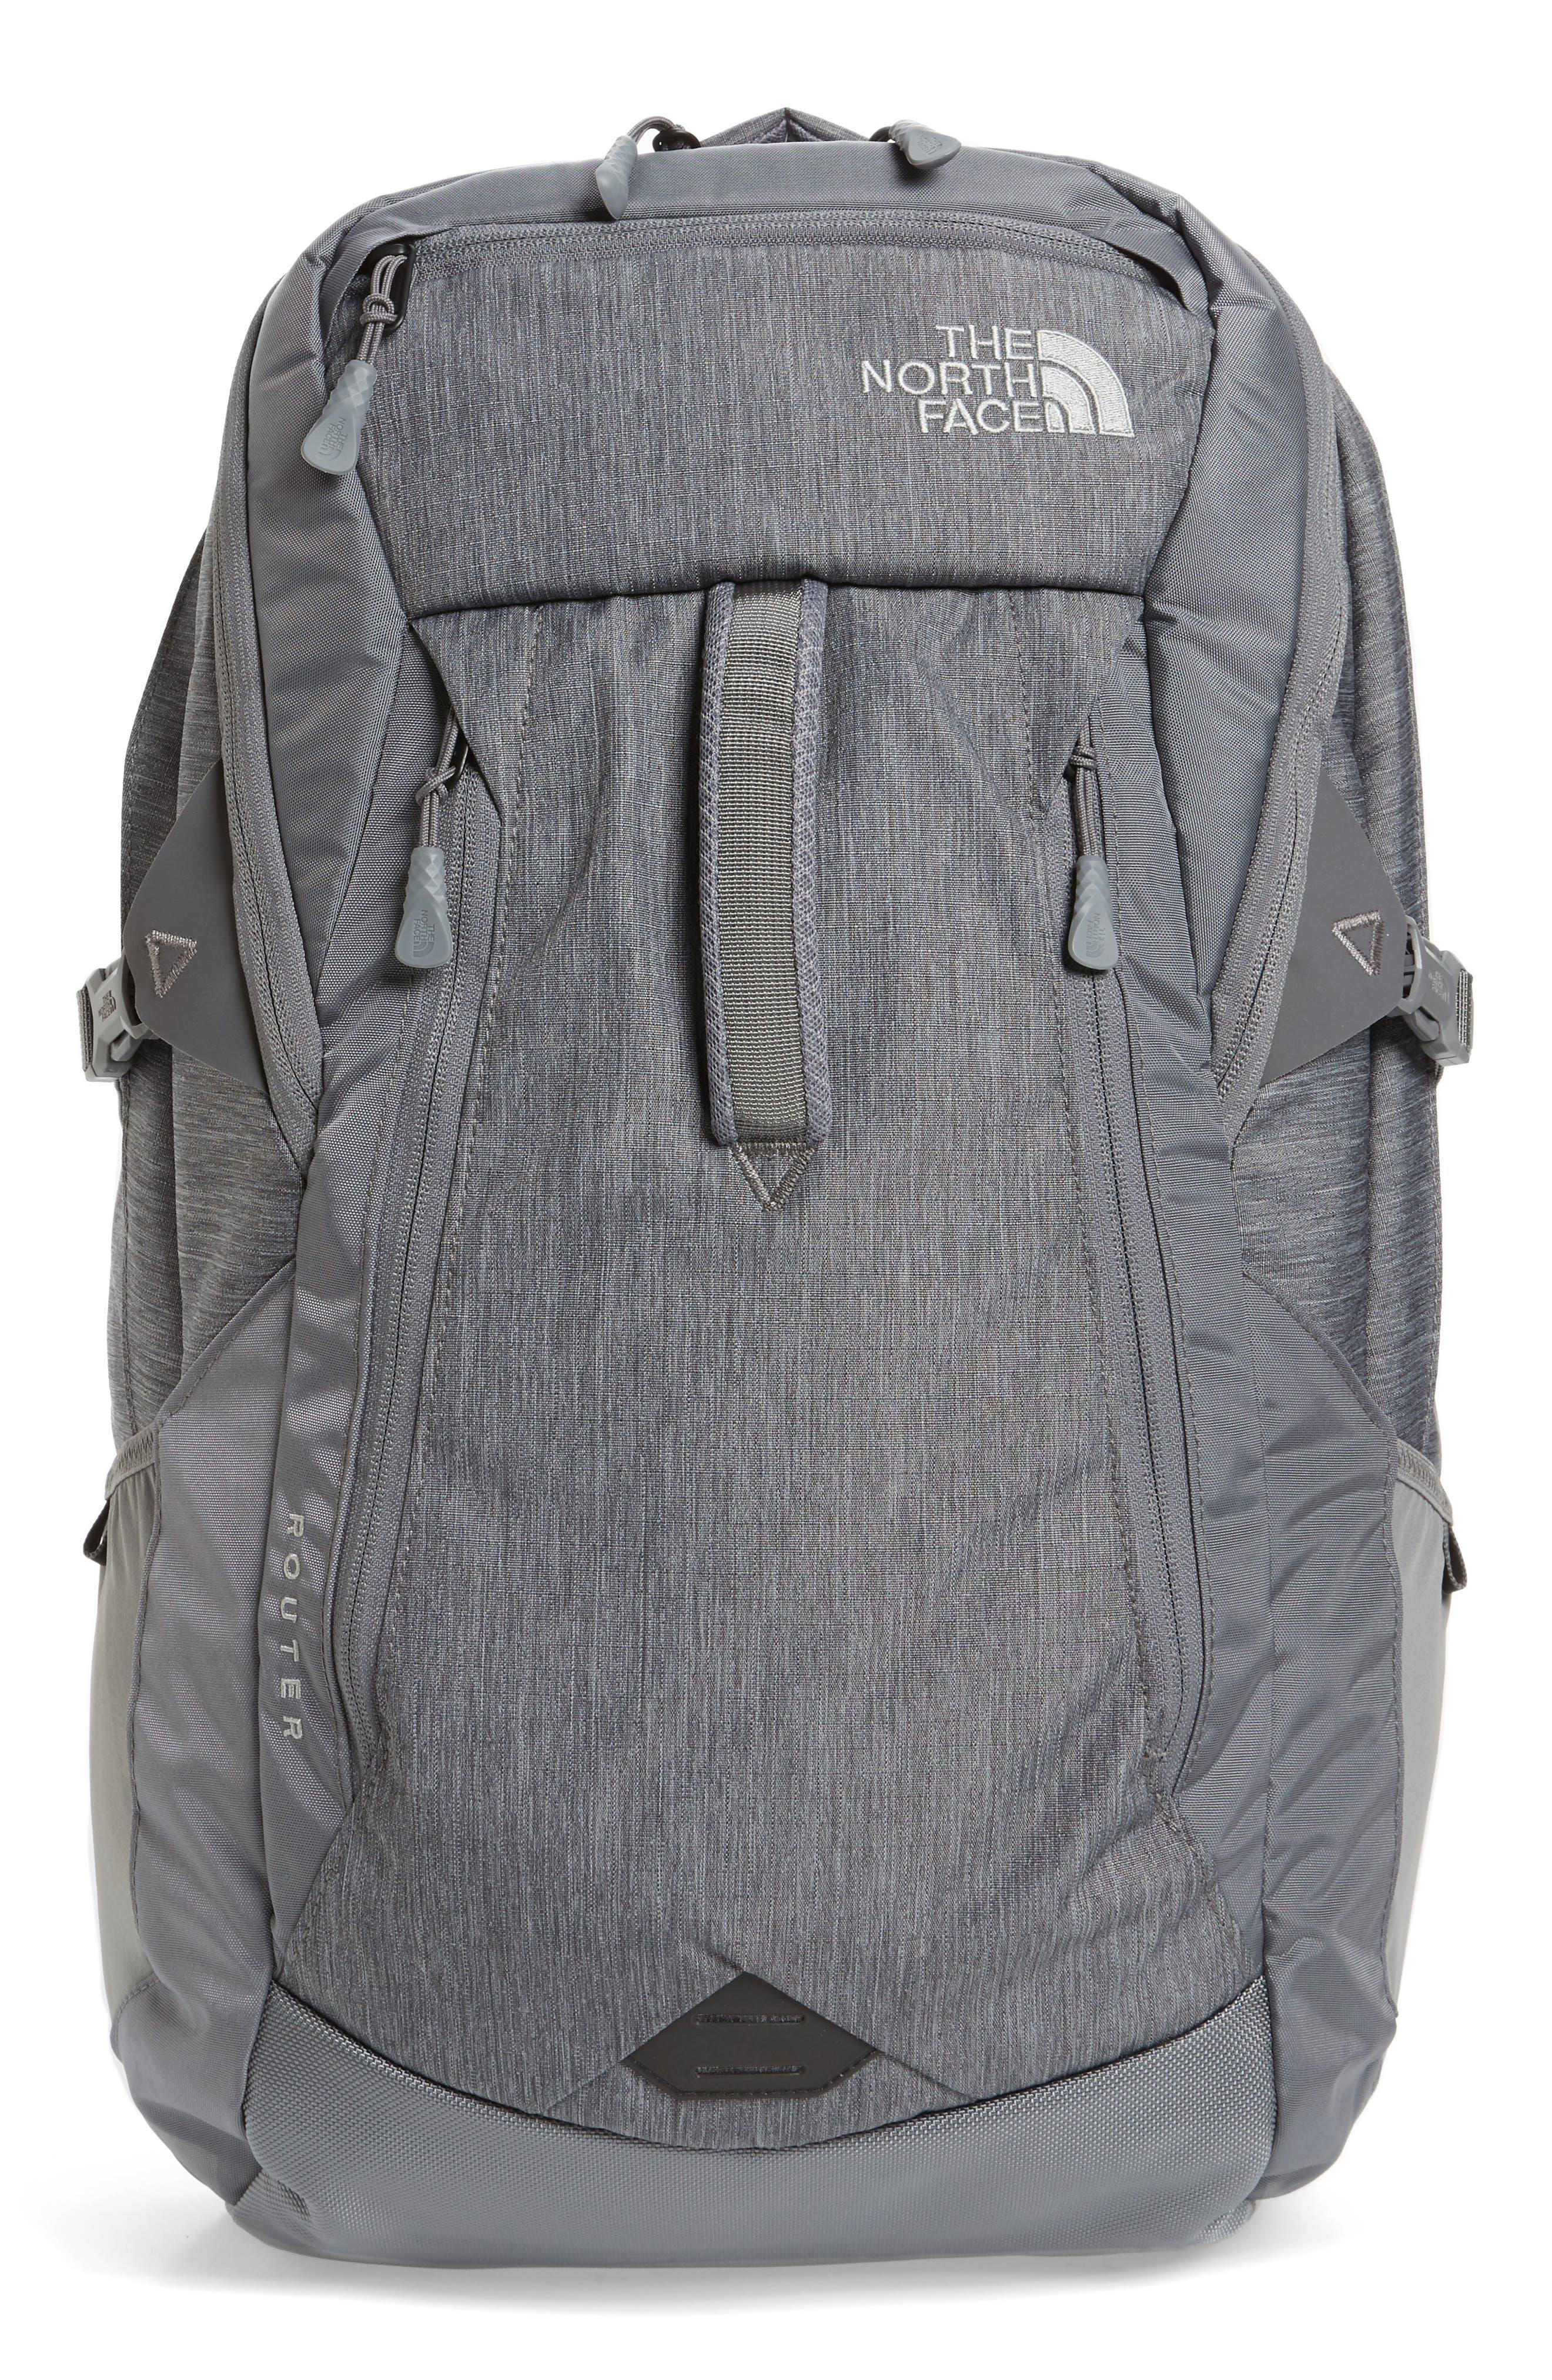 Router Backpack,                             Main thumbnail 1, color,                             Medium Grey Heather/ Zinc Grey